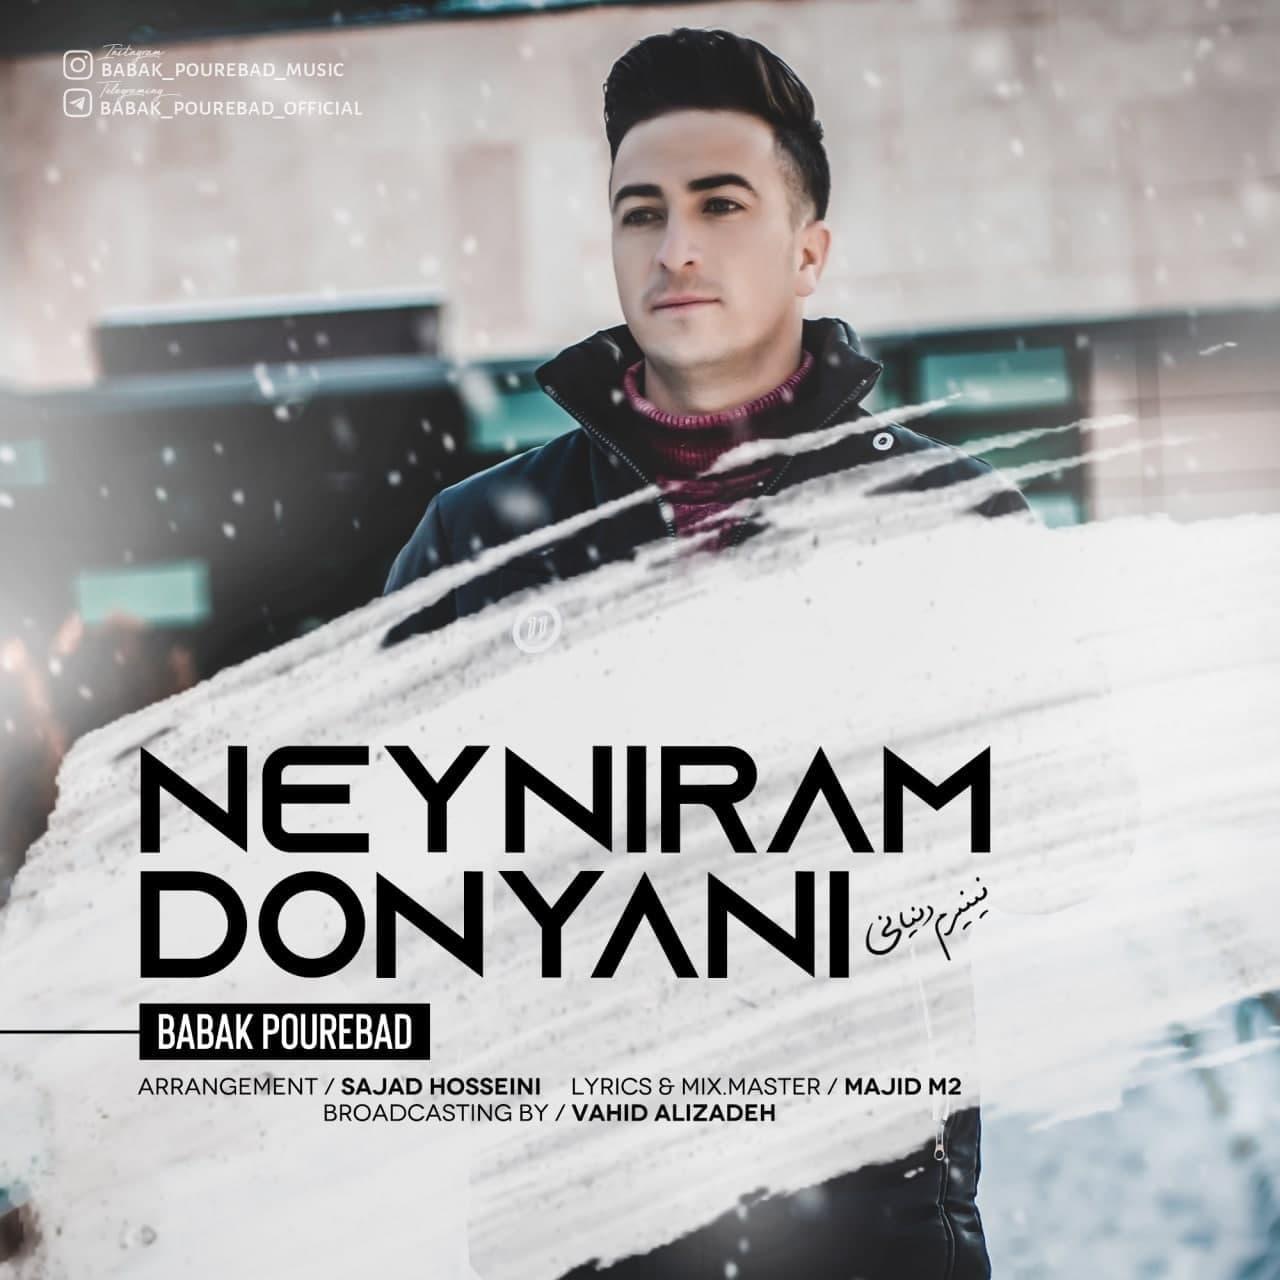 https://s19.picofile.com/file/8437202926/03Babak_Pourebad_Neyniram_Donyani.jpg